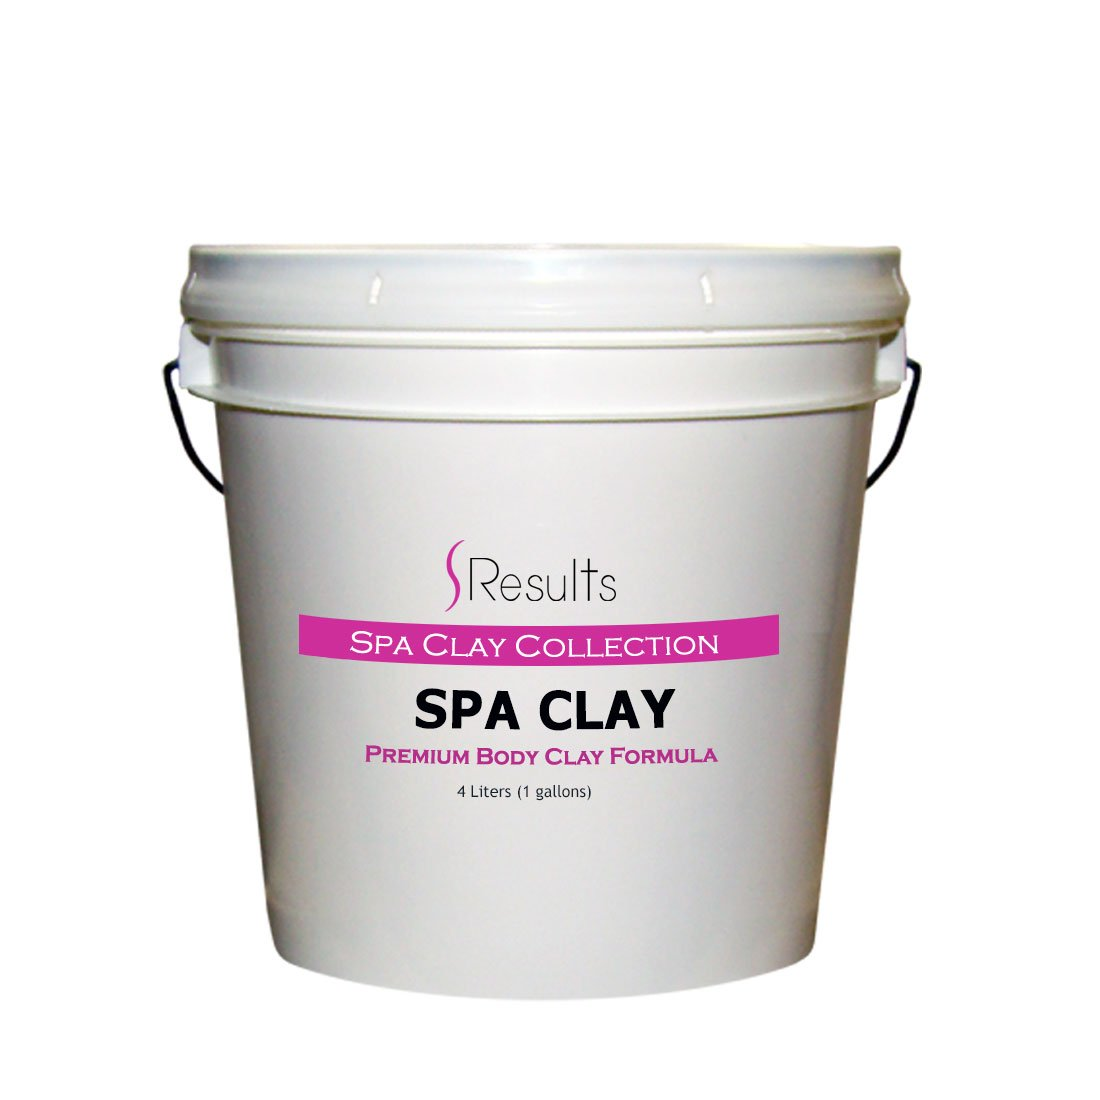 Spa Clay (Sea Clay) Body Wrap Formula - 1 gallon (4 liter)